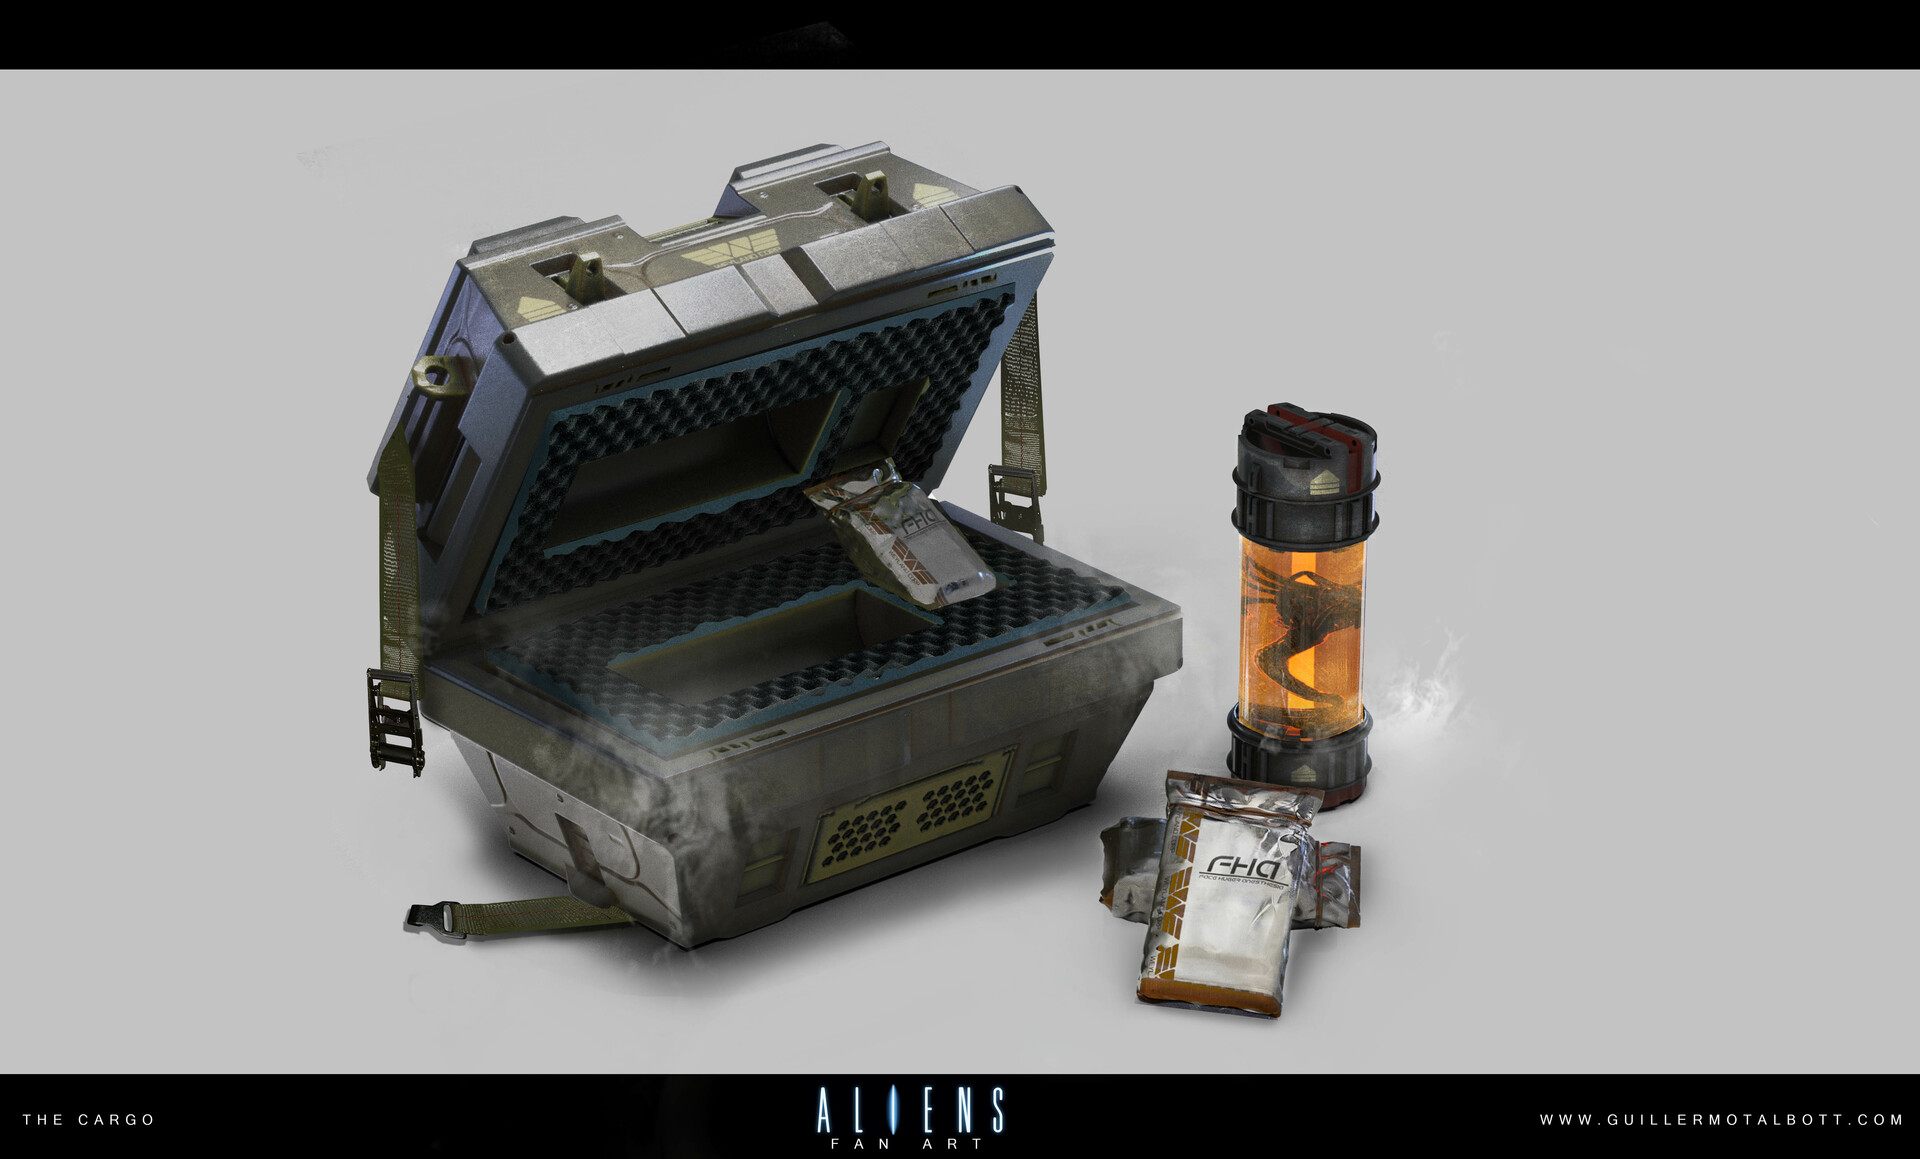 Guillermo talbott alien crate a